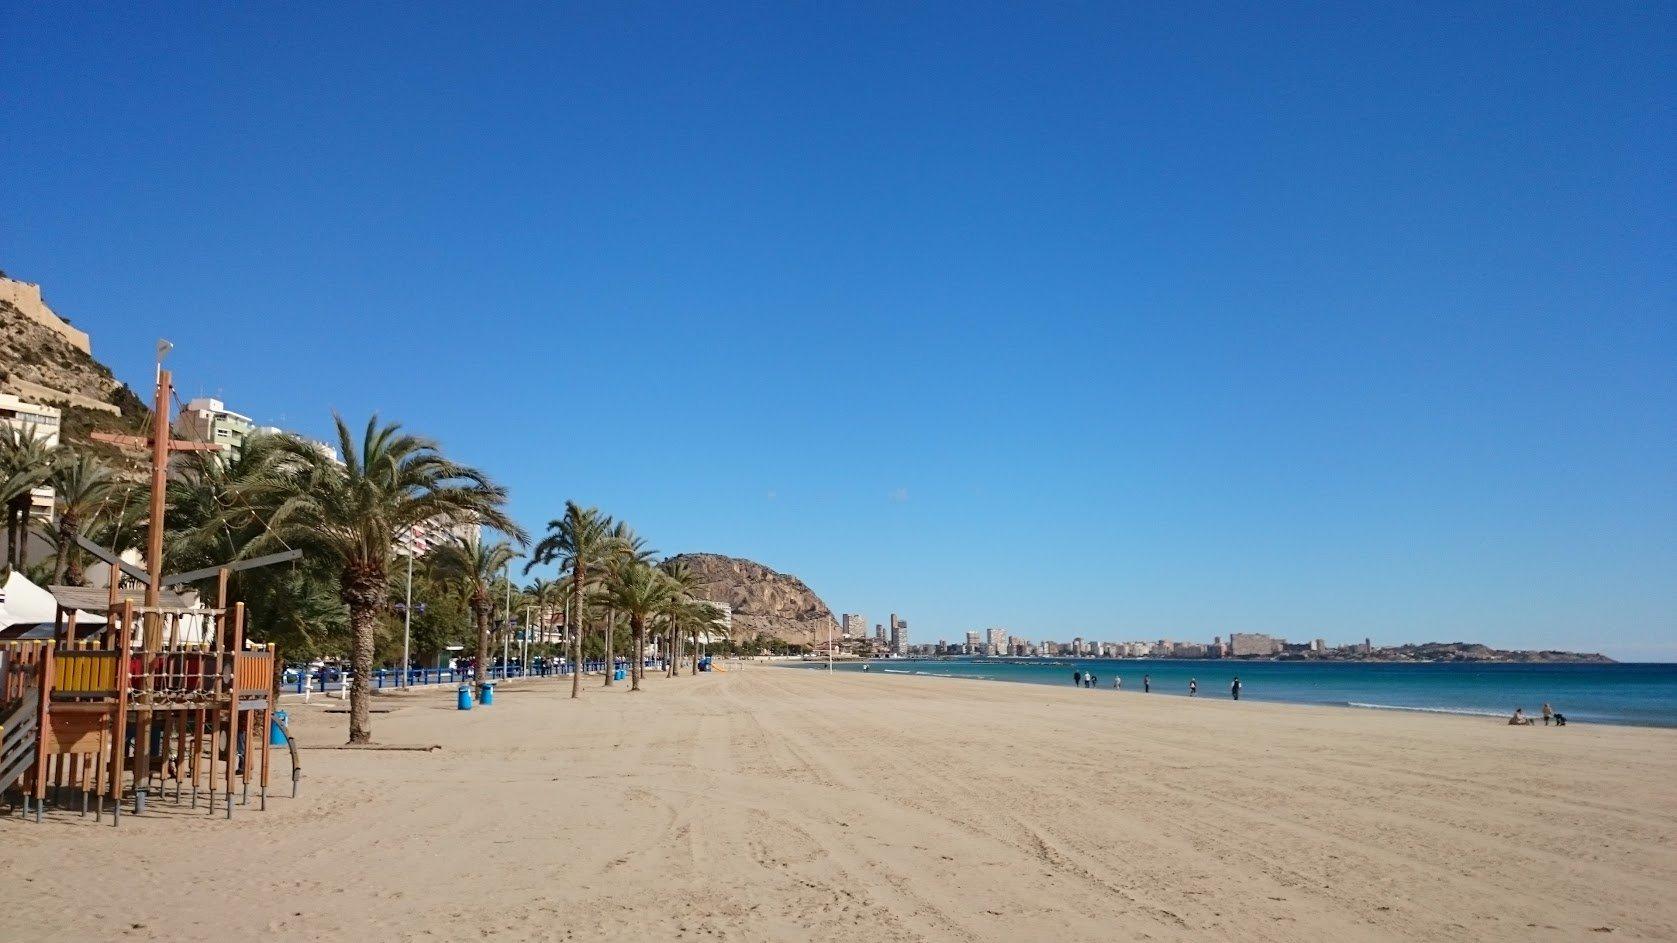 Alicante Postiquet bach